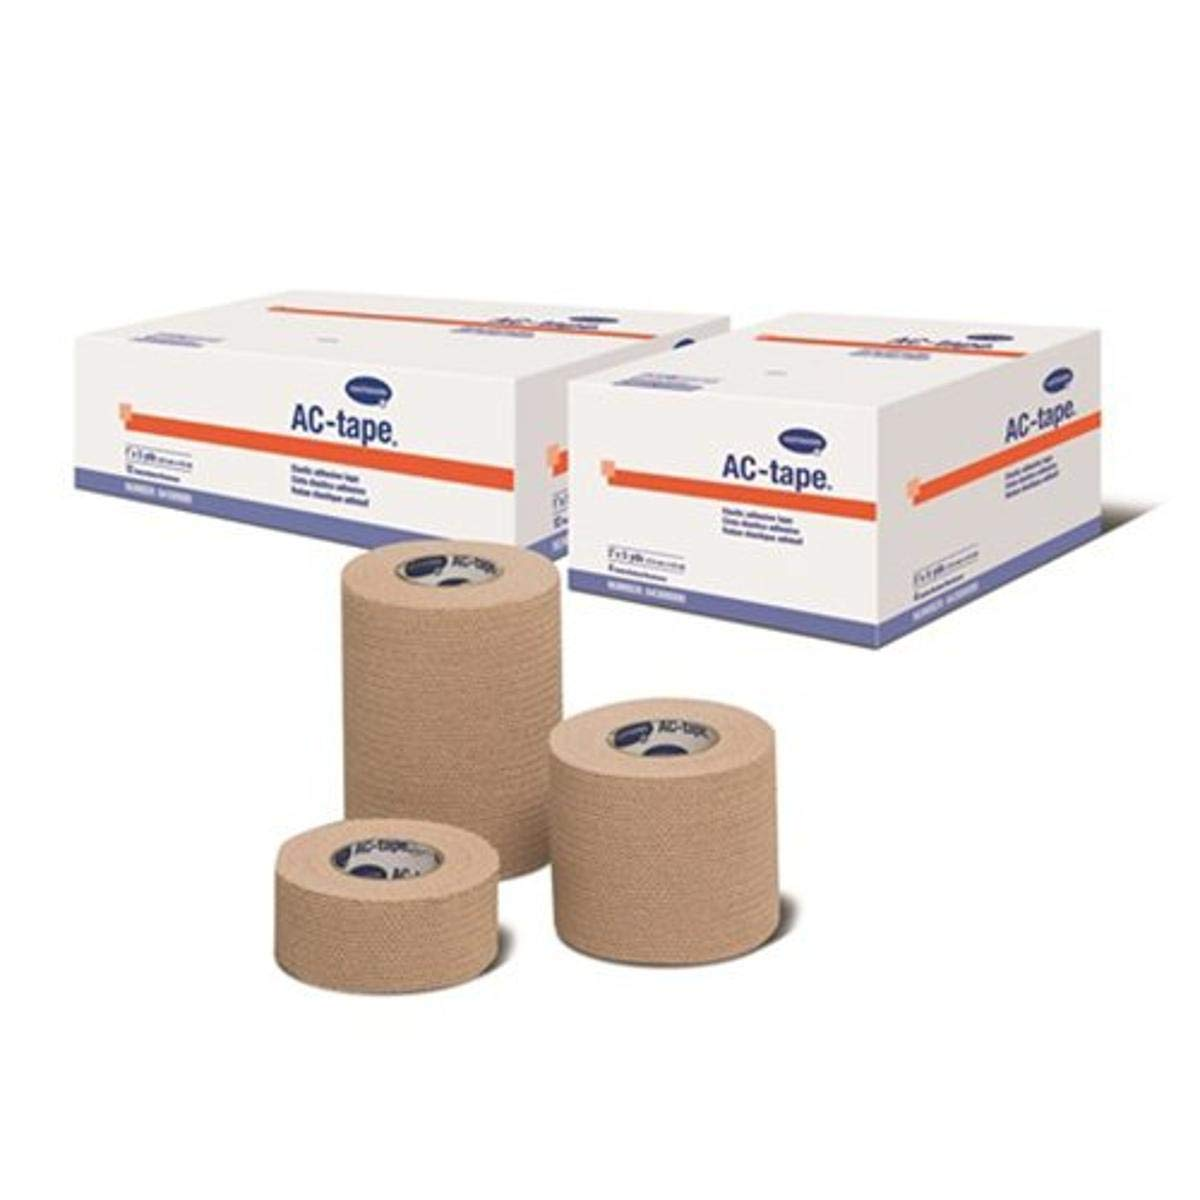 Speedpack of 24 Hartmann AC-Tape AC-Tape 2 x 5 yd roll